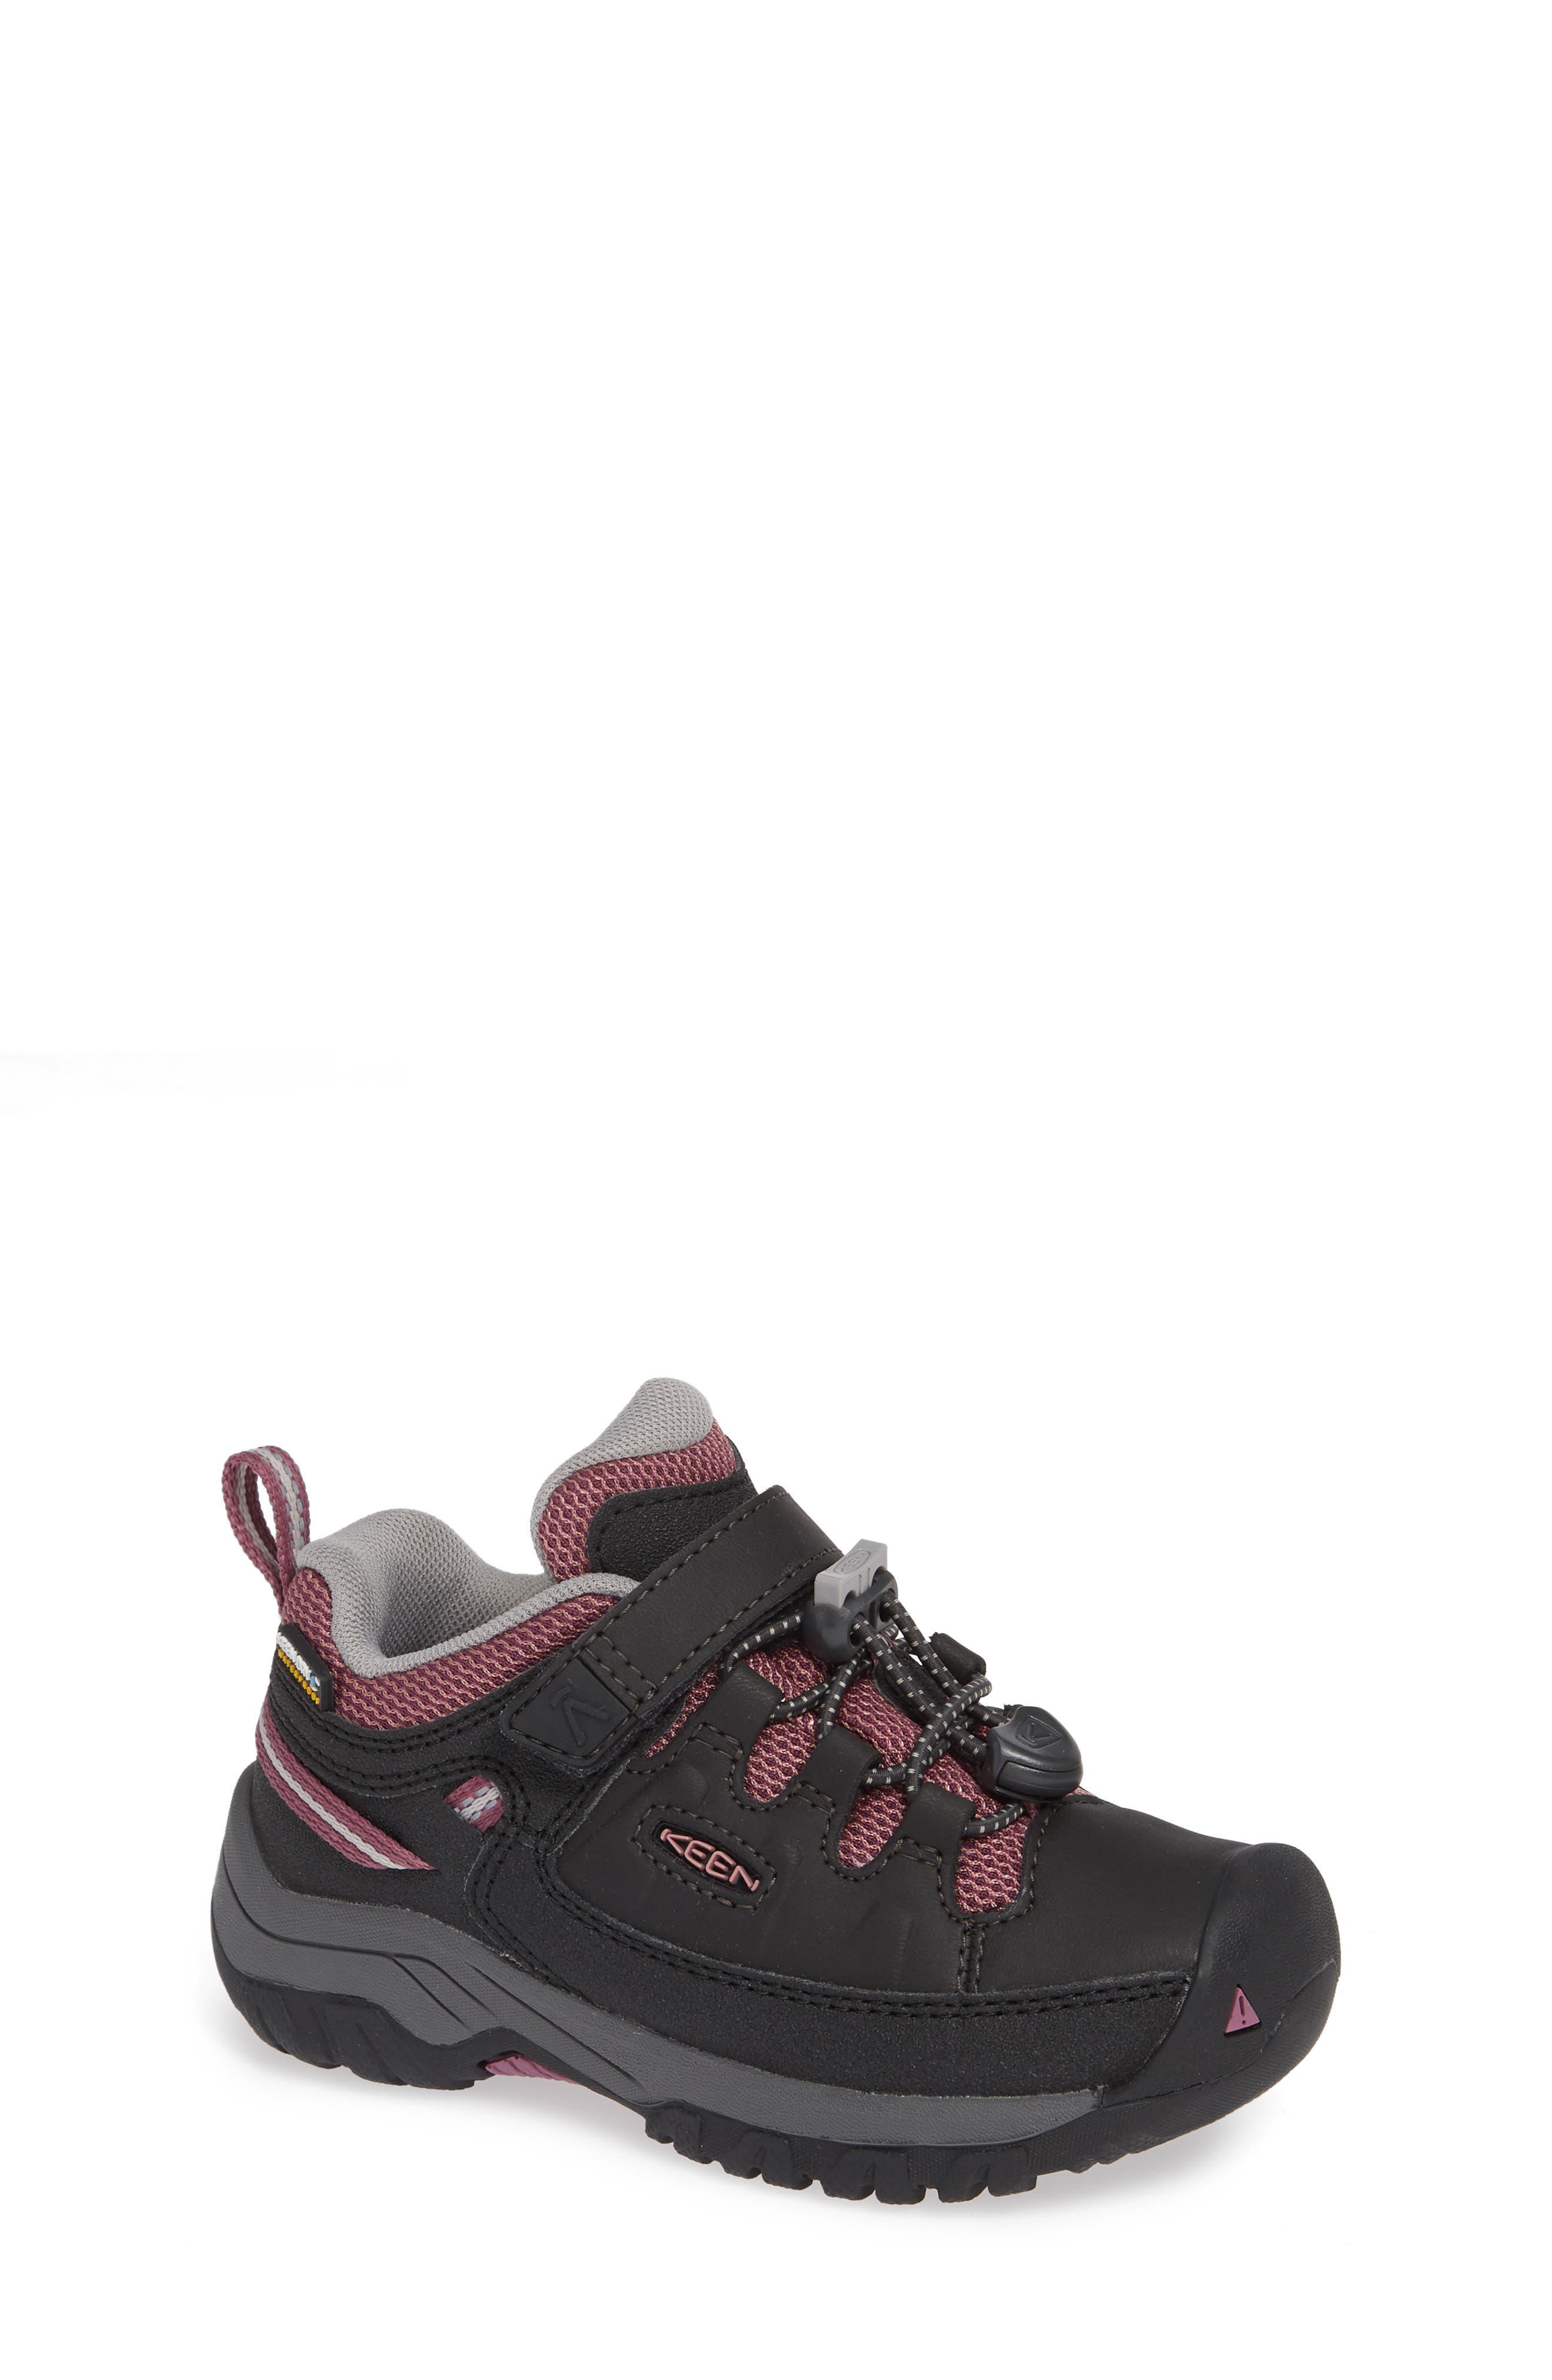 KEEN Targhee Low Waterproof Sneaker, Main, color, RAVEN/ TULIPWOOD